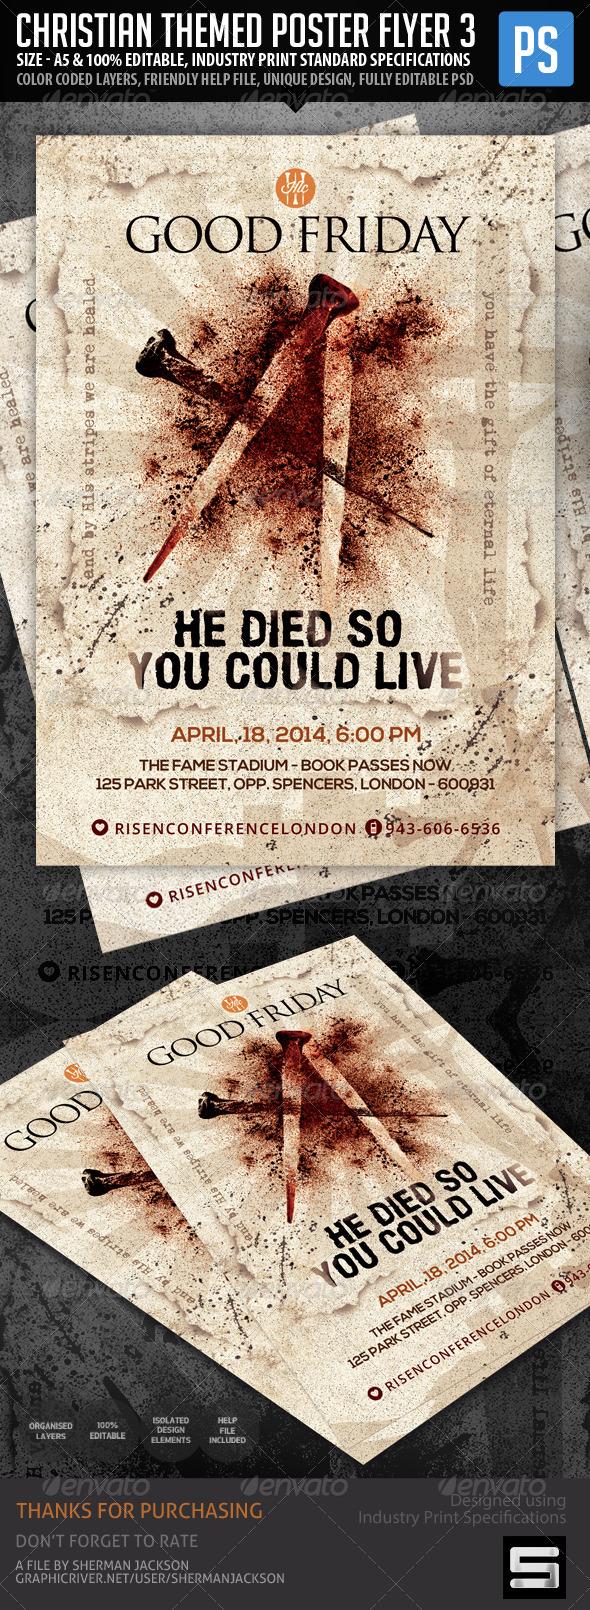 Church/Christian Themed Poster/Flyer Vol.3 - Church Flyers